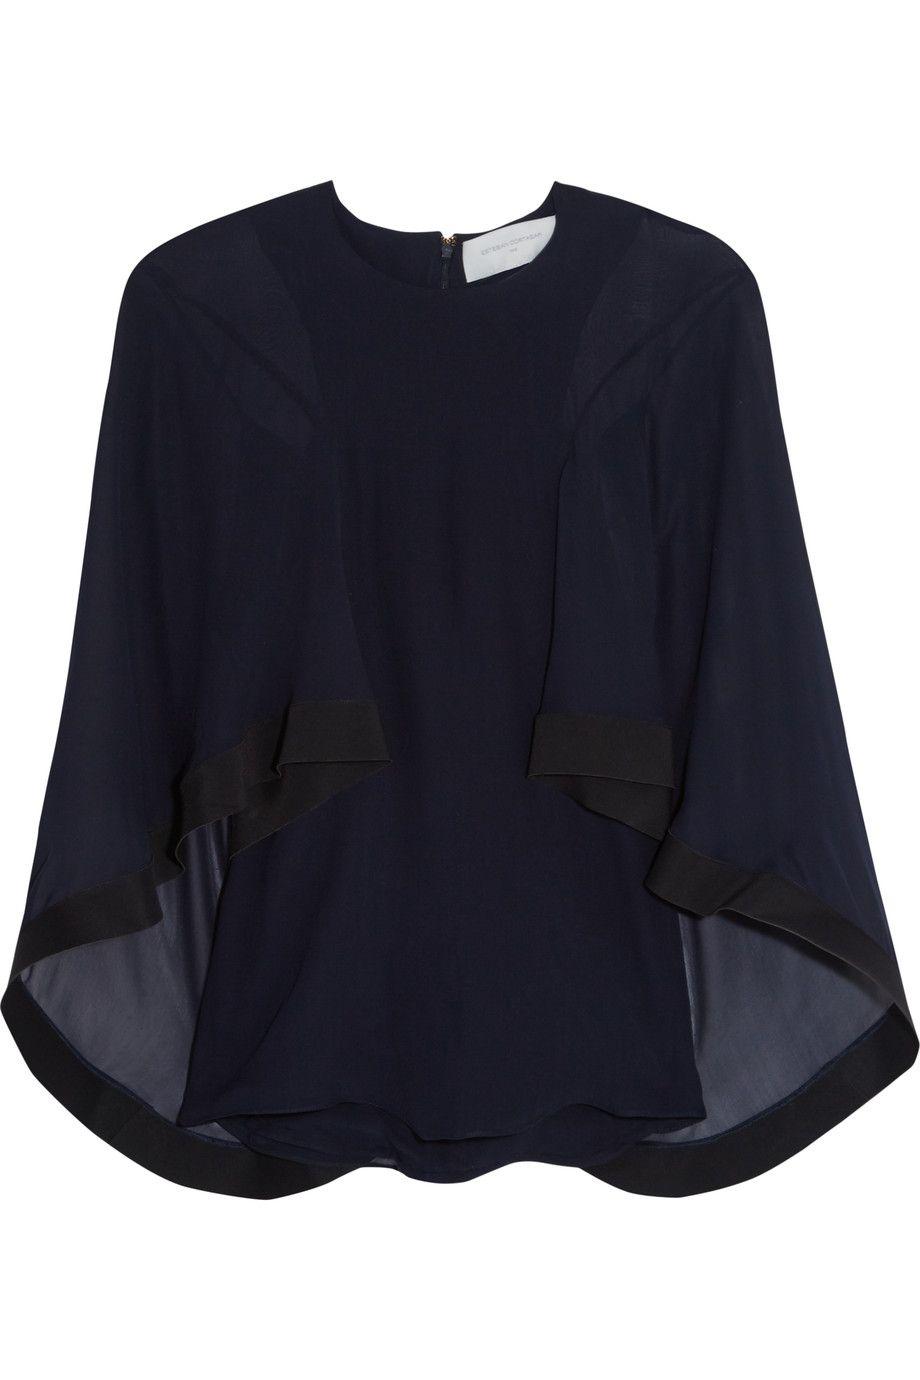 ESTEBAN CORTAZAR Cape-effect cady-trimmed silk-chiffon blouse. #estebancortazar #cloth #blouse